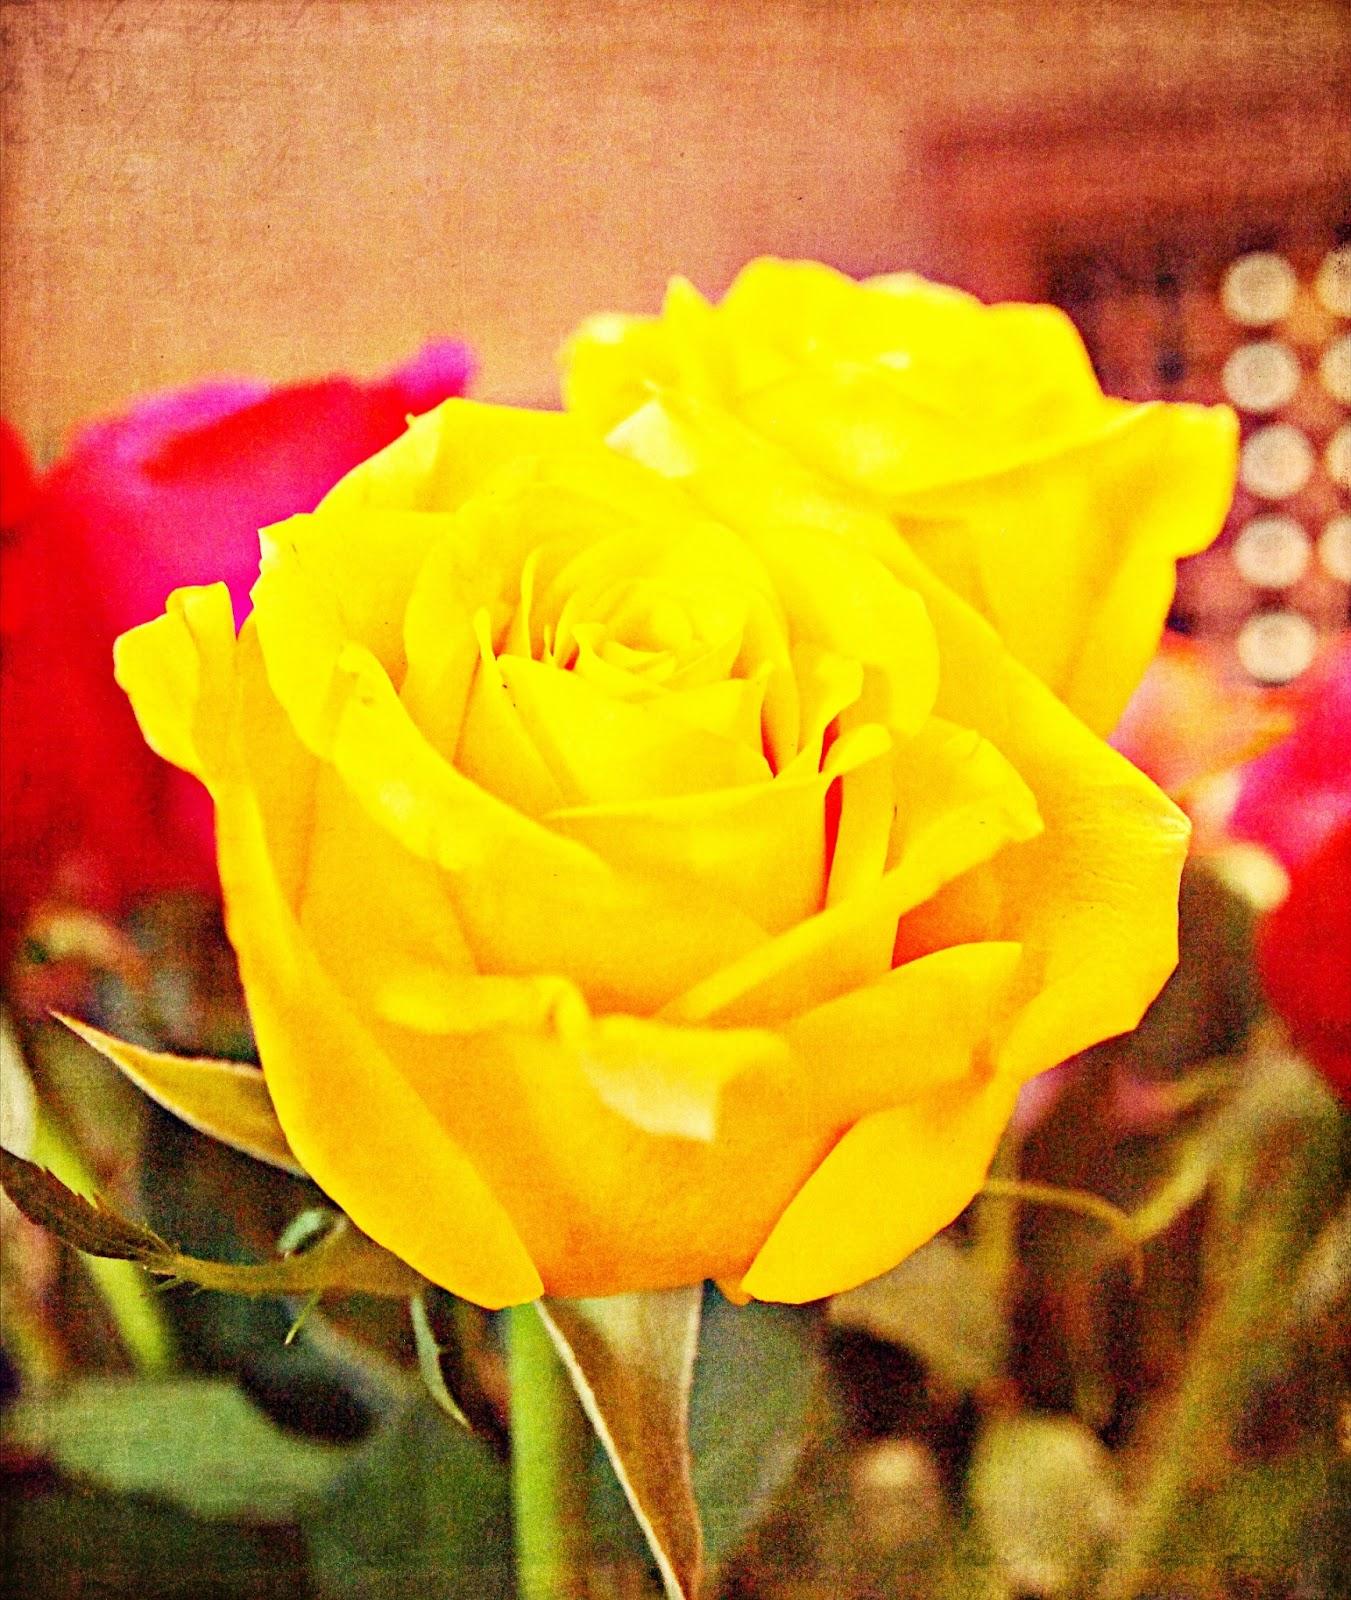 texture yellow rose